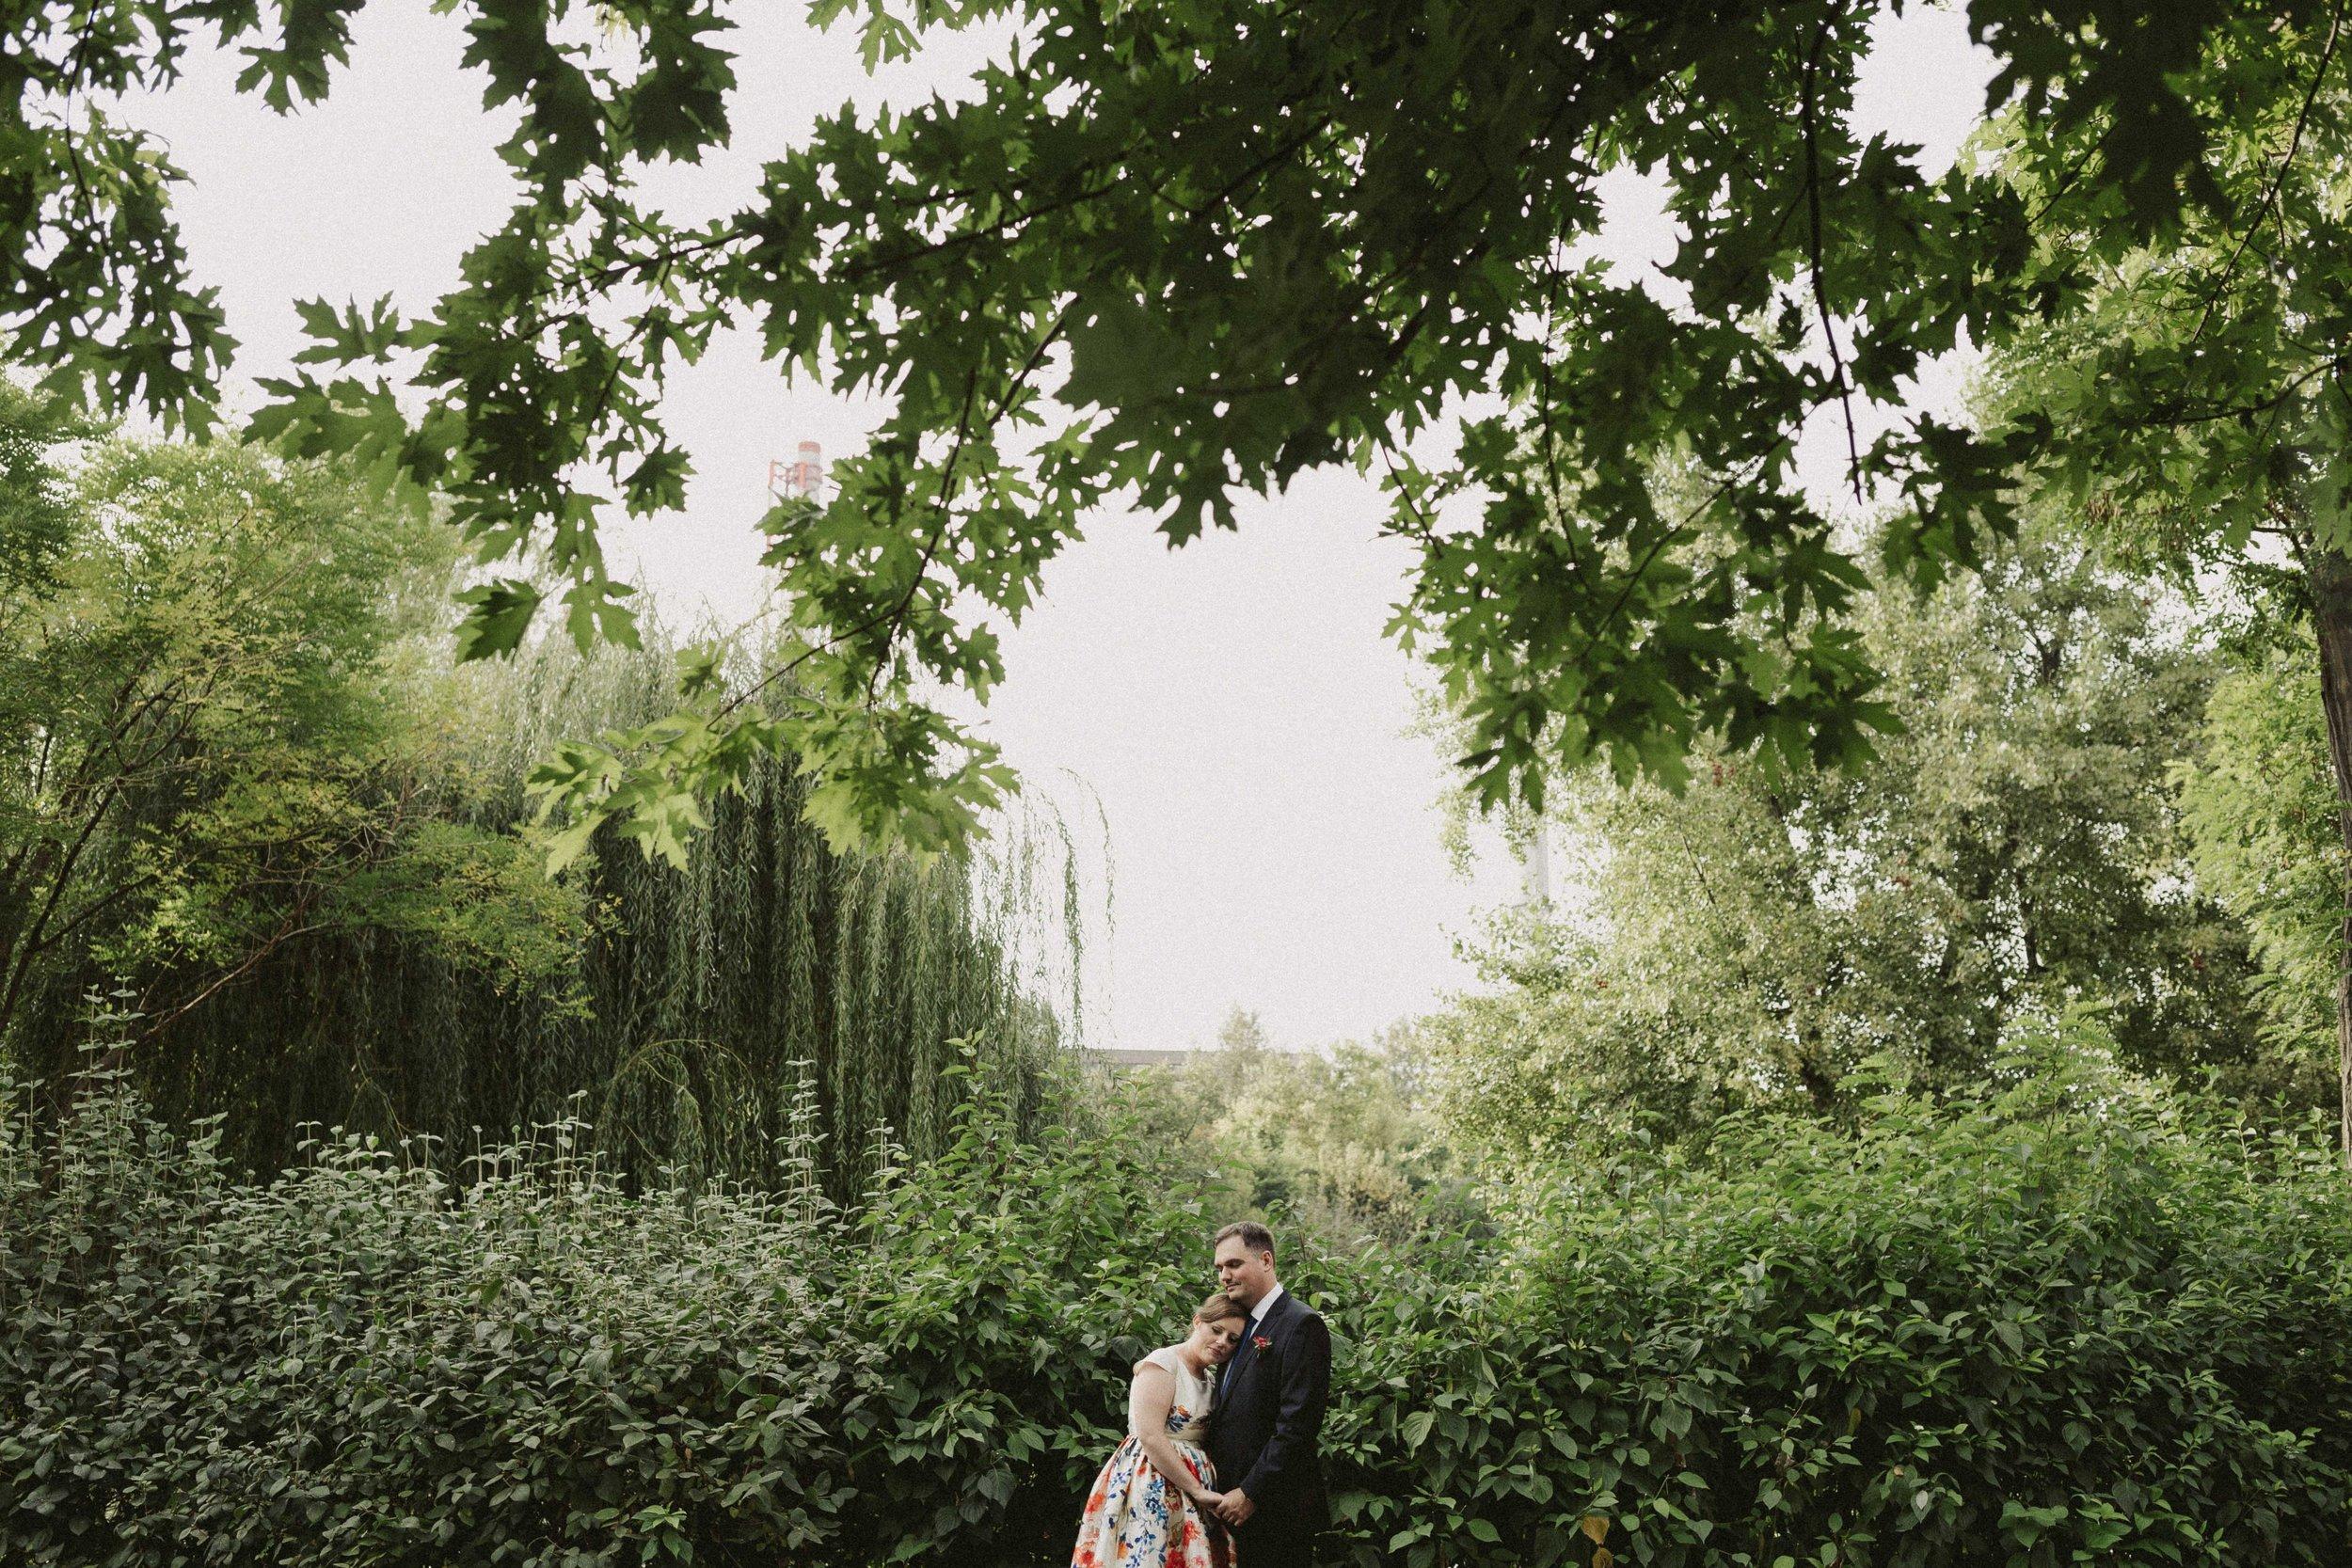 20160924_Hanak_Feher_wedding_w_158__MG_0853.jpg